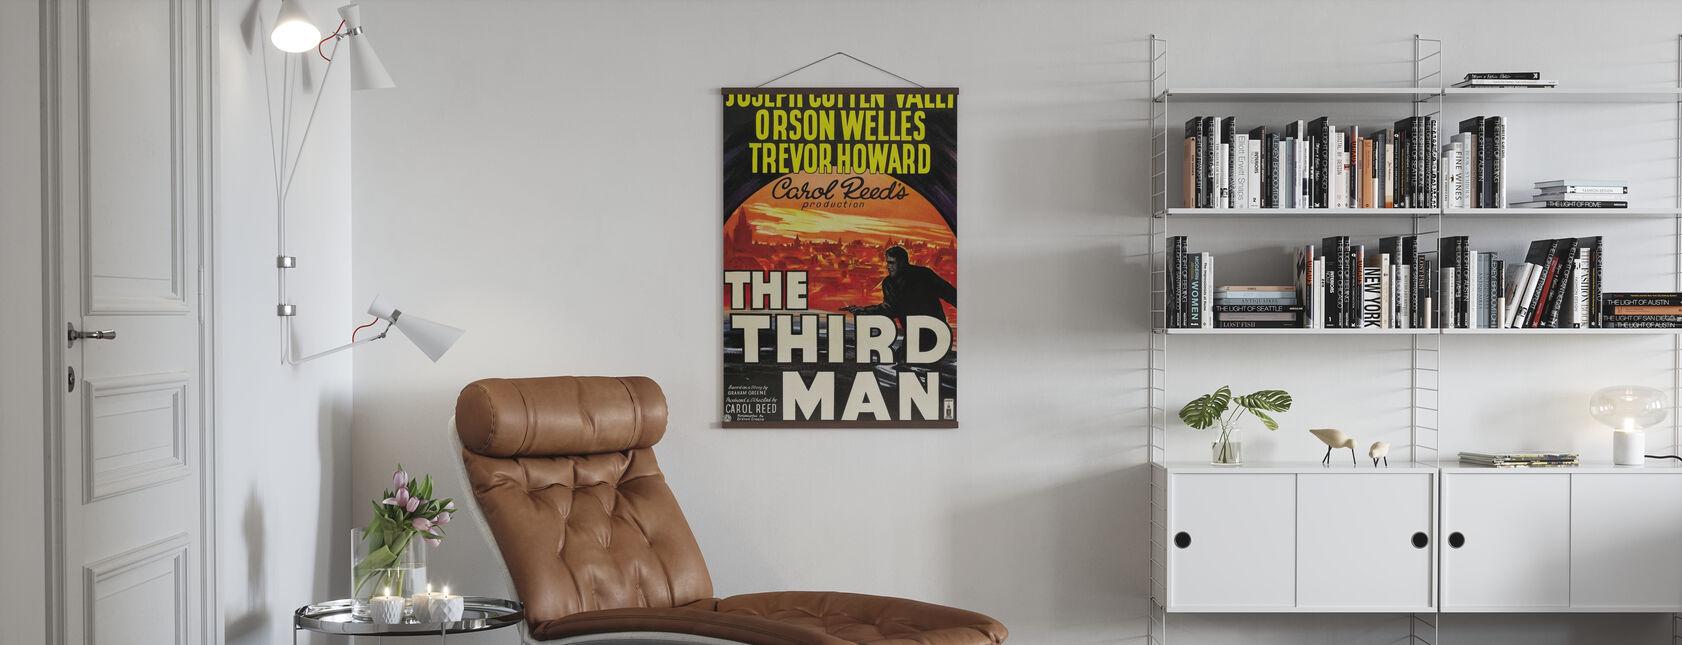 Dritter Mann - Poster - Wohnzimmer